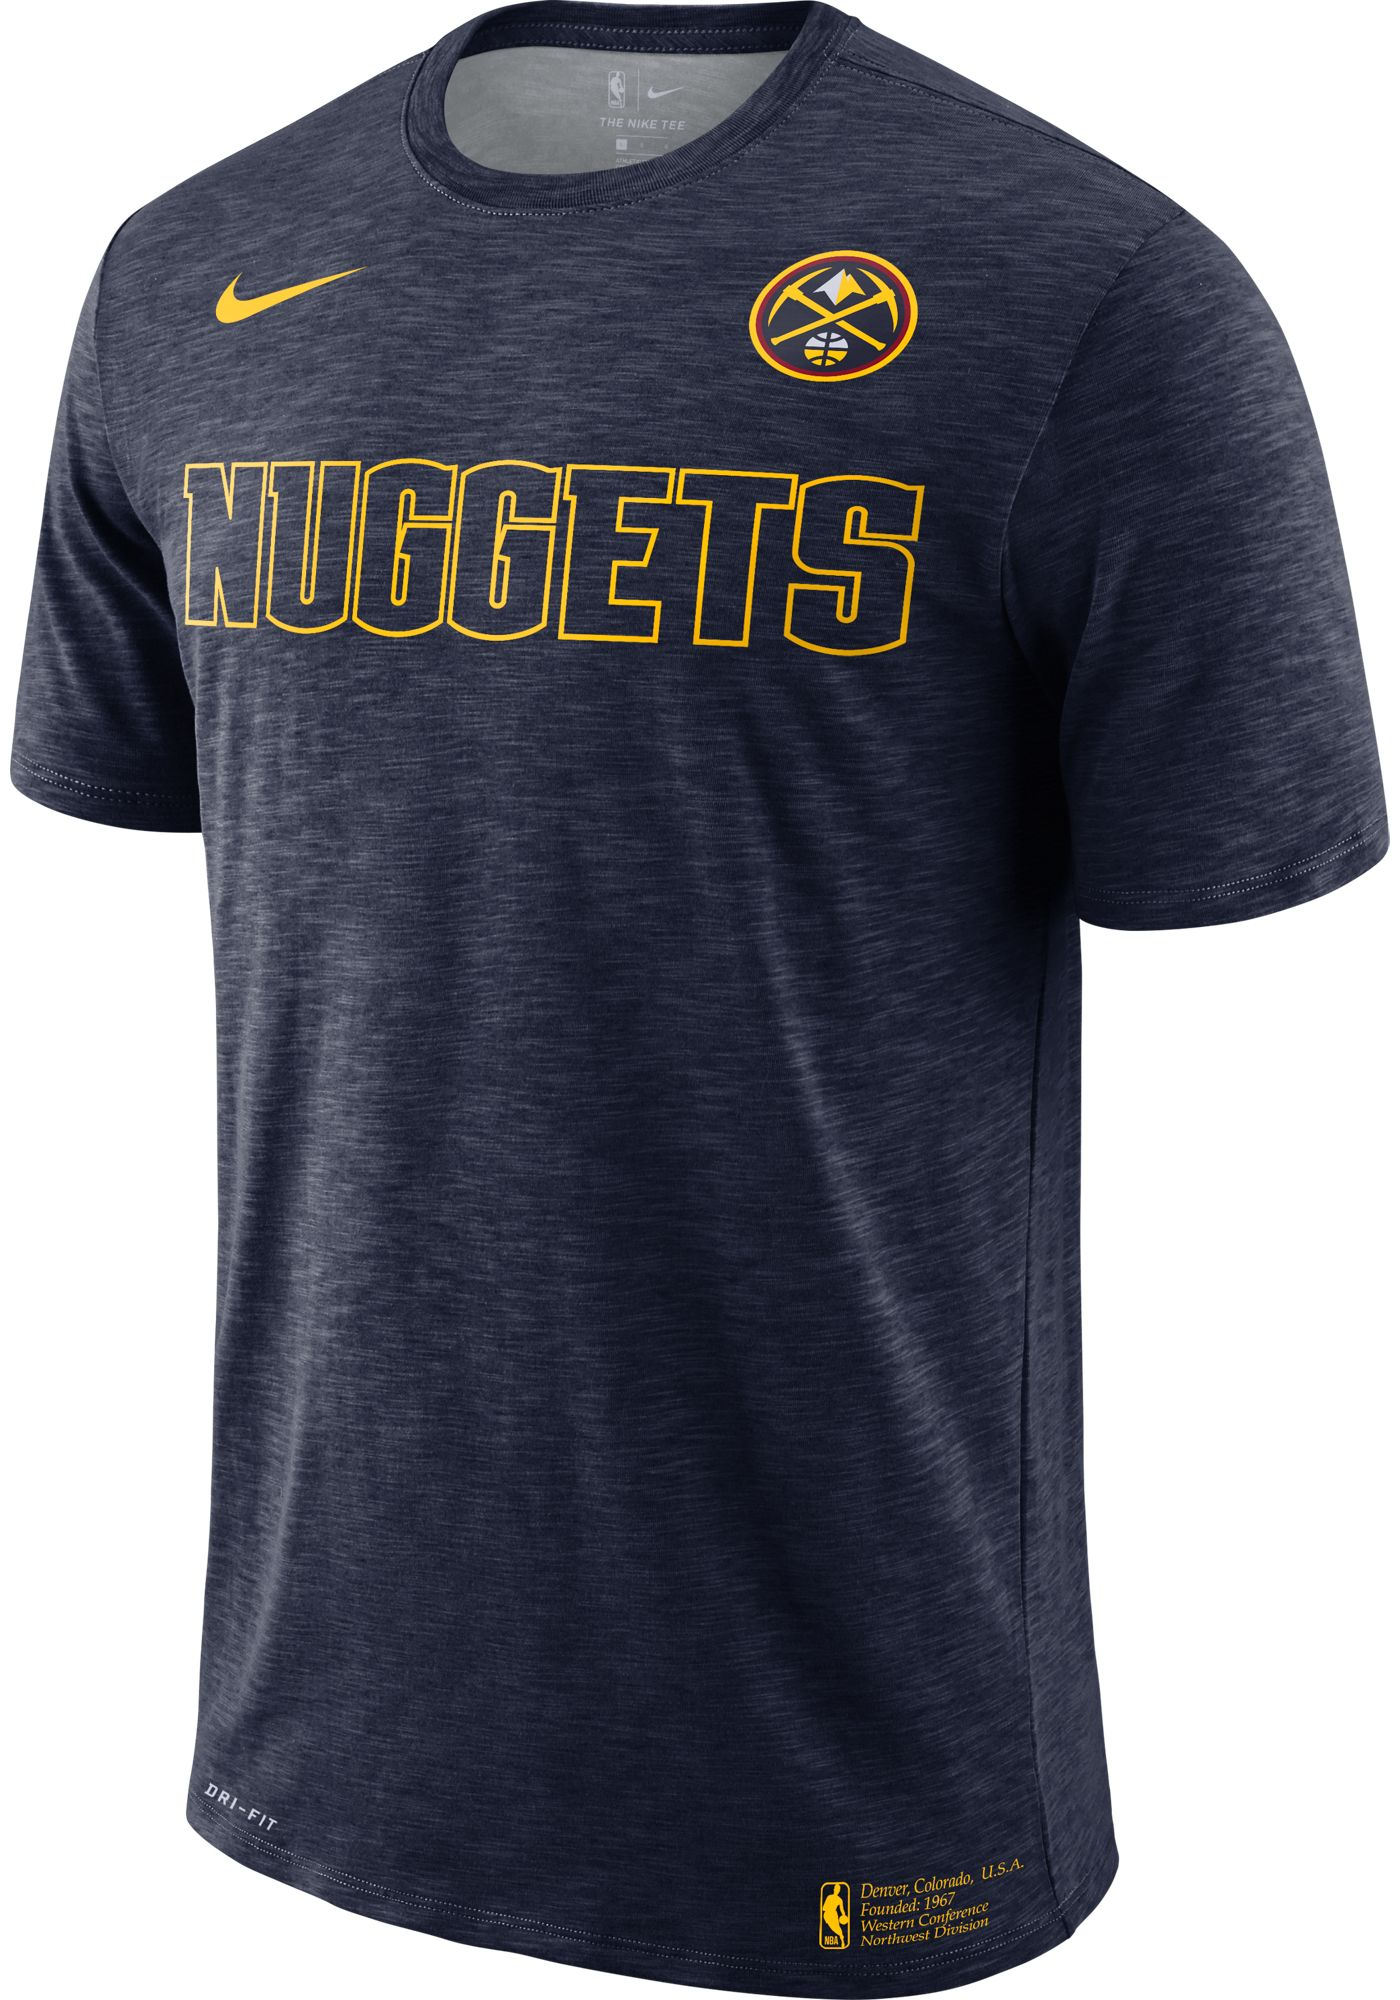 Nike Men's Denver Nuggets Dri-FIT Facility T-Shirt